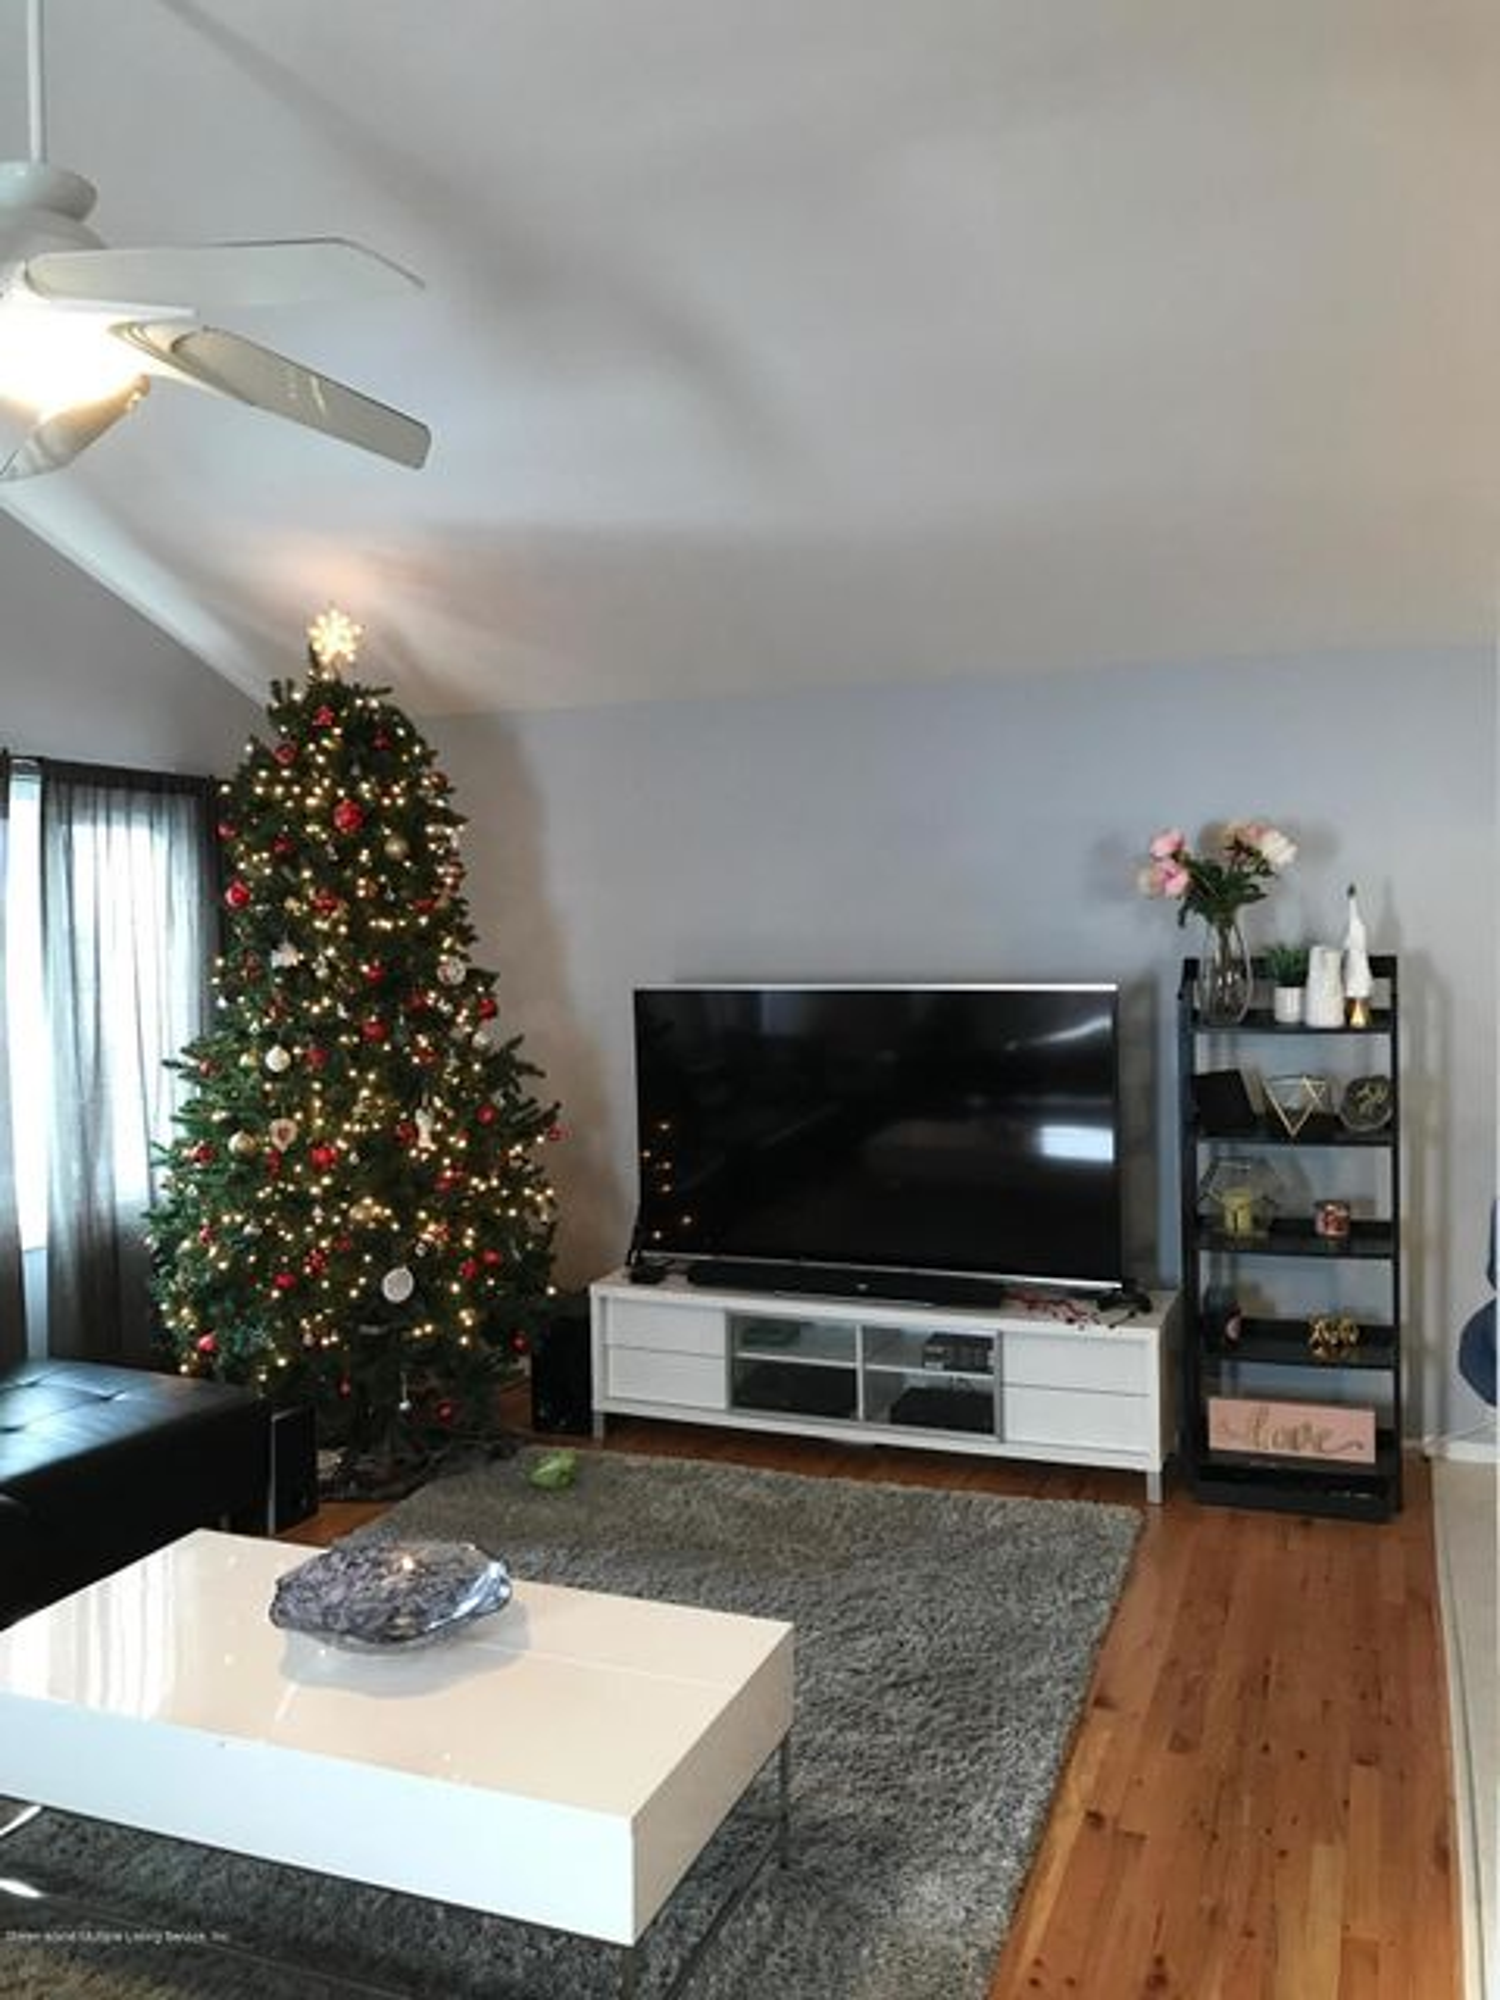 Single Family - Semi-Attached 383 Brookfield Avenue  Staten Island, NY 10308, MLS-1115793-14